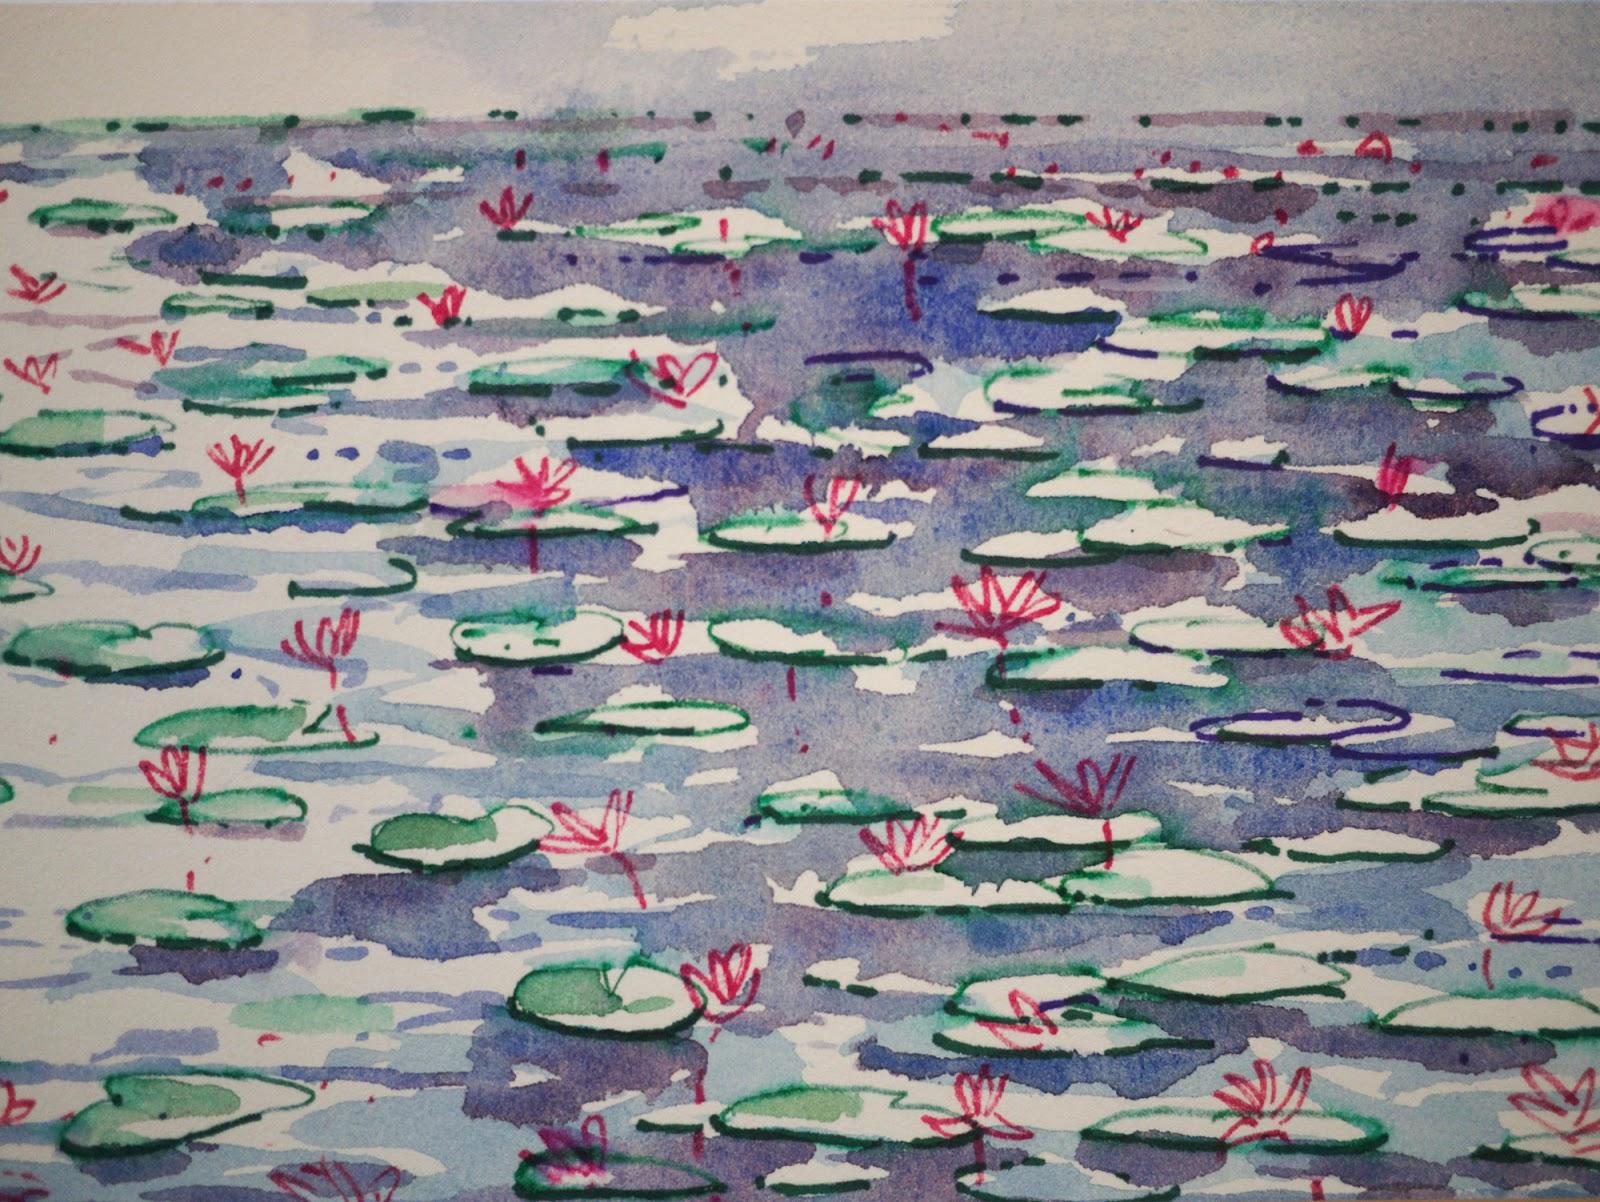 Royal College of Art RCA Secret postcard sale 2013 Luke Elwes